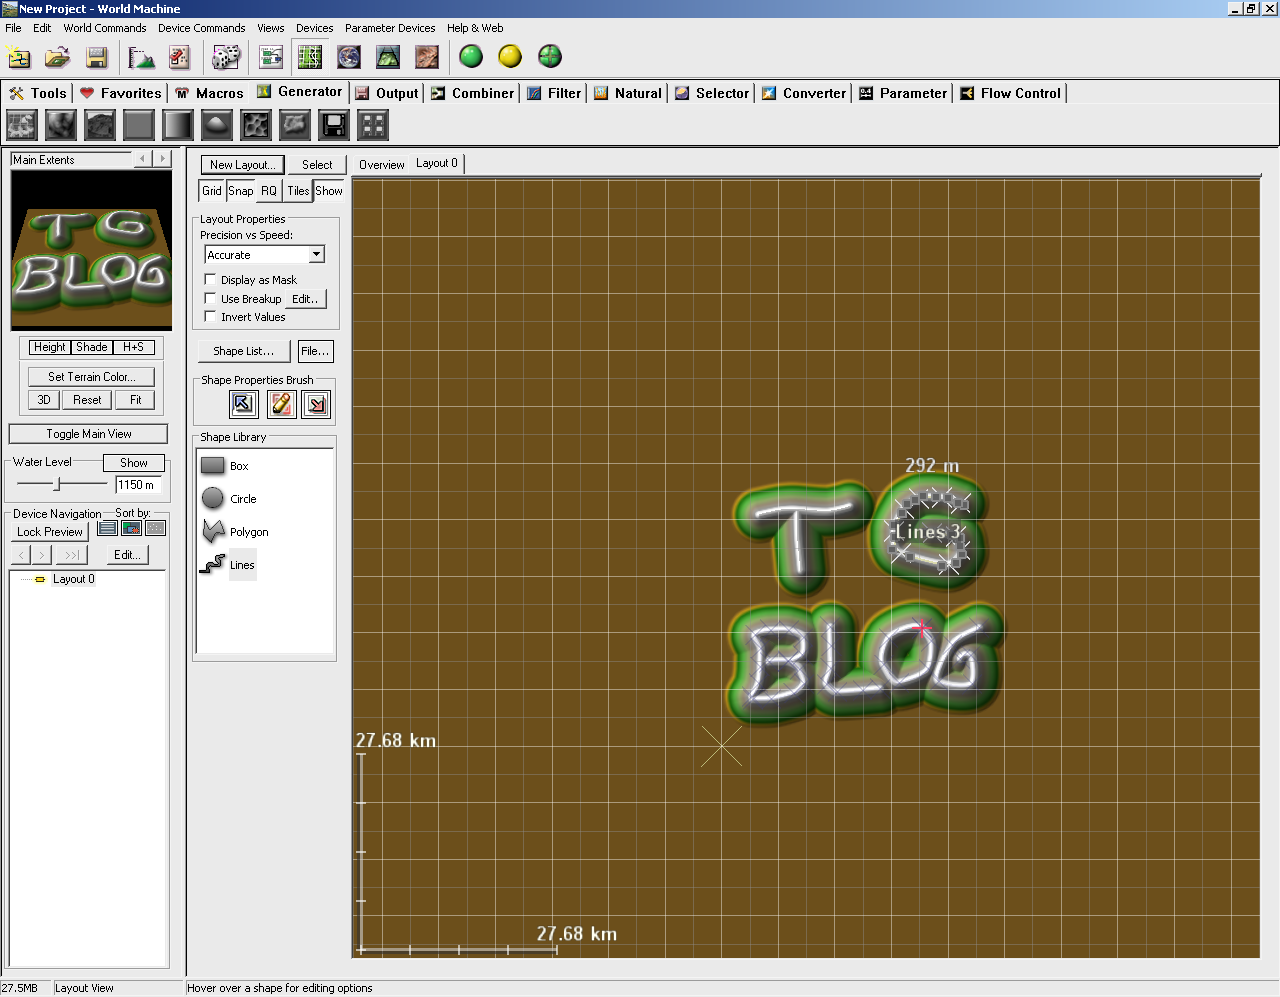 TGBlog » World Machine 2 released «